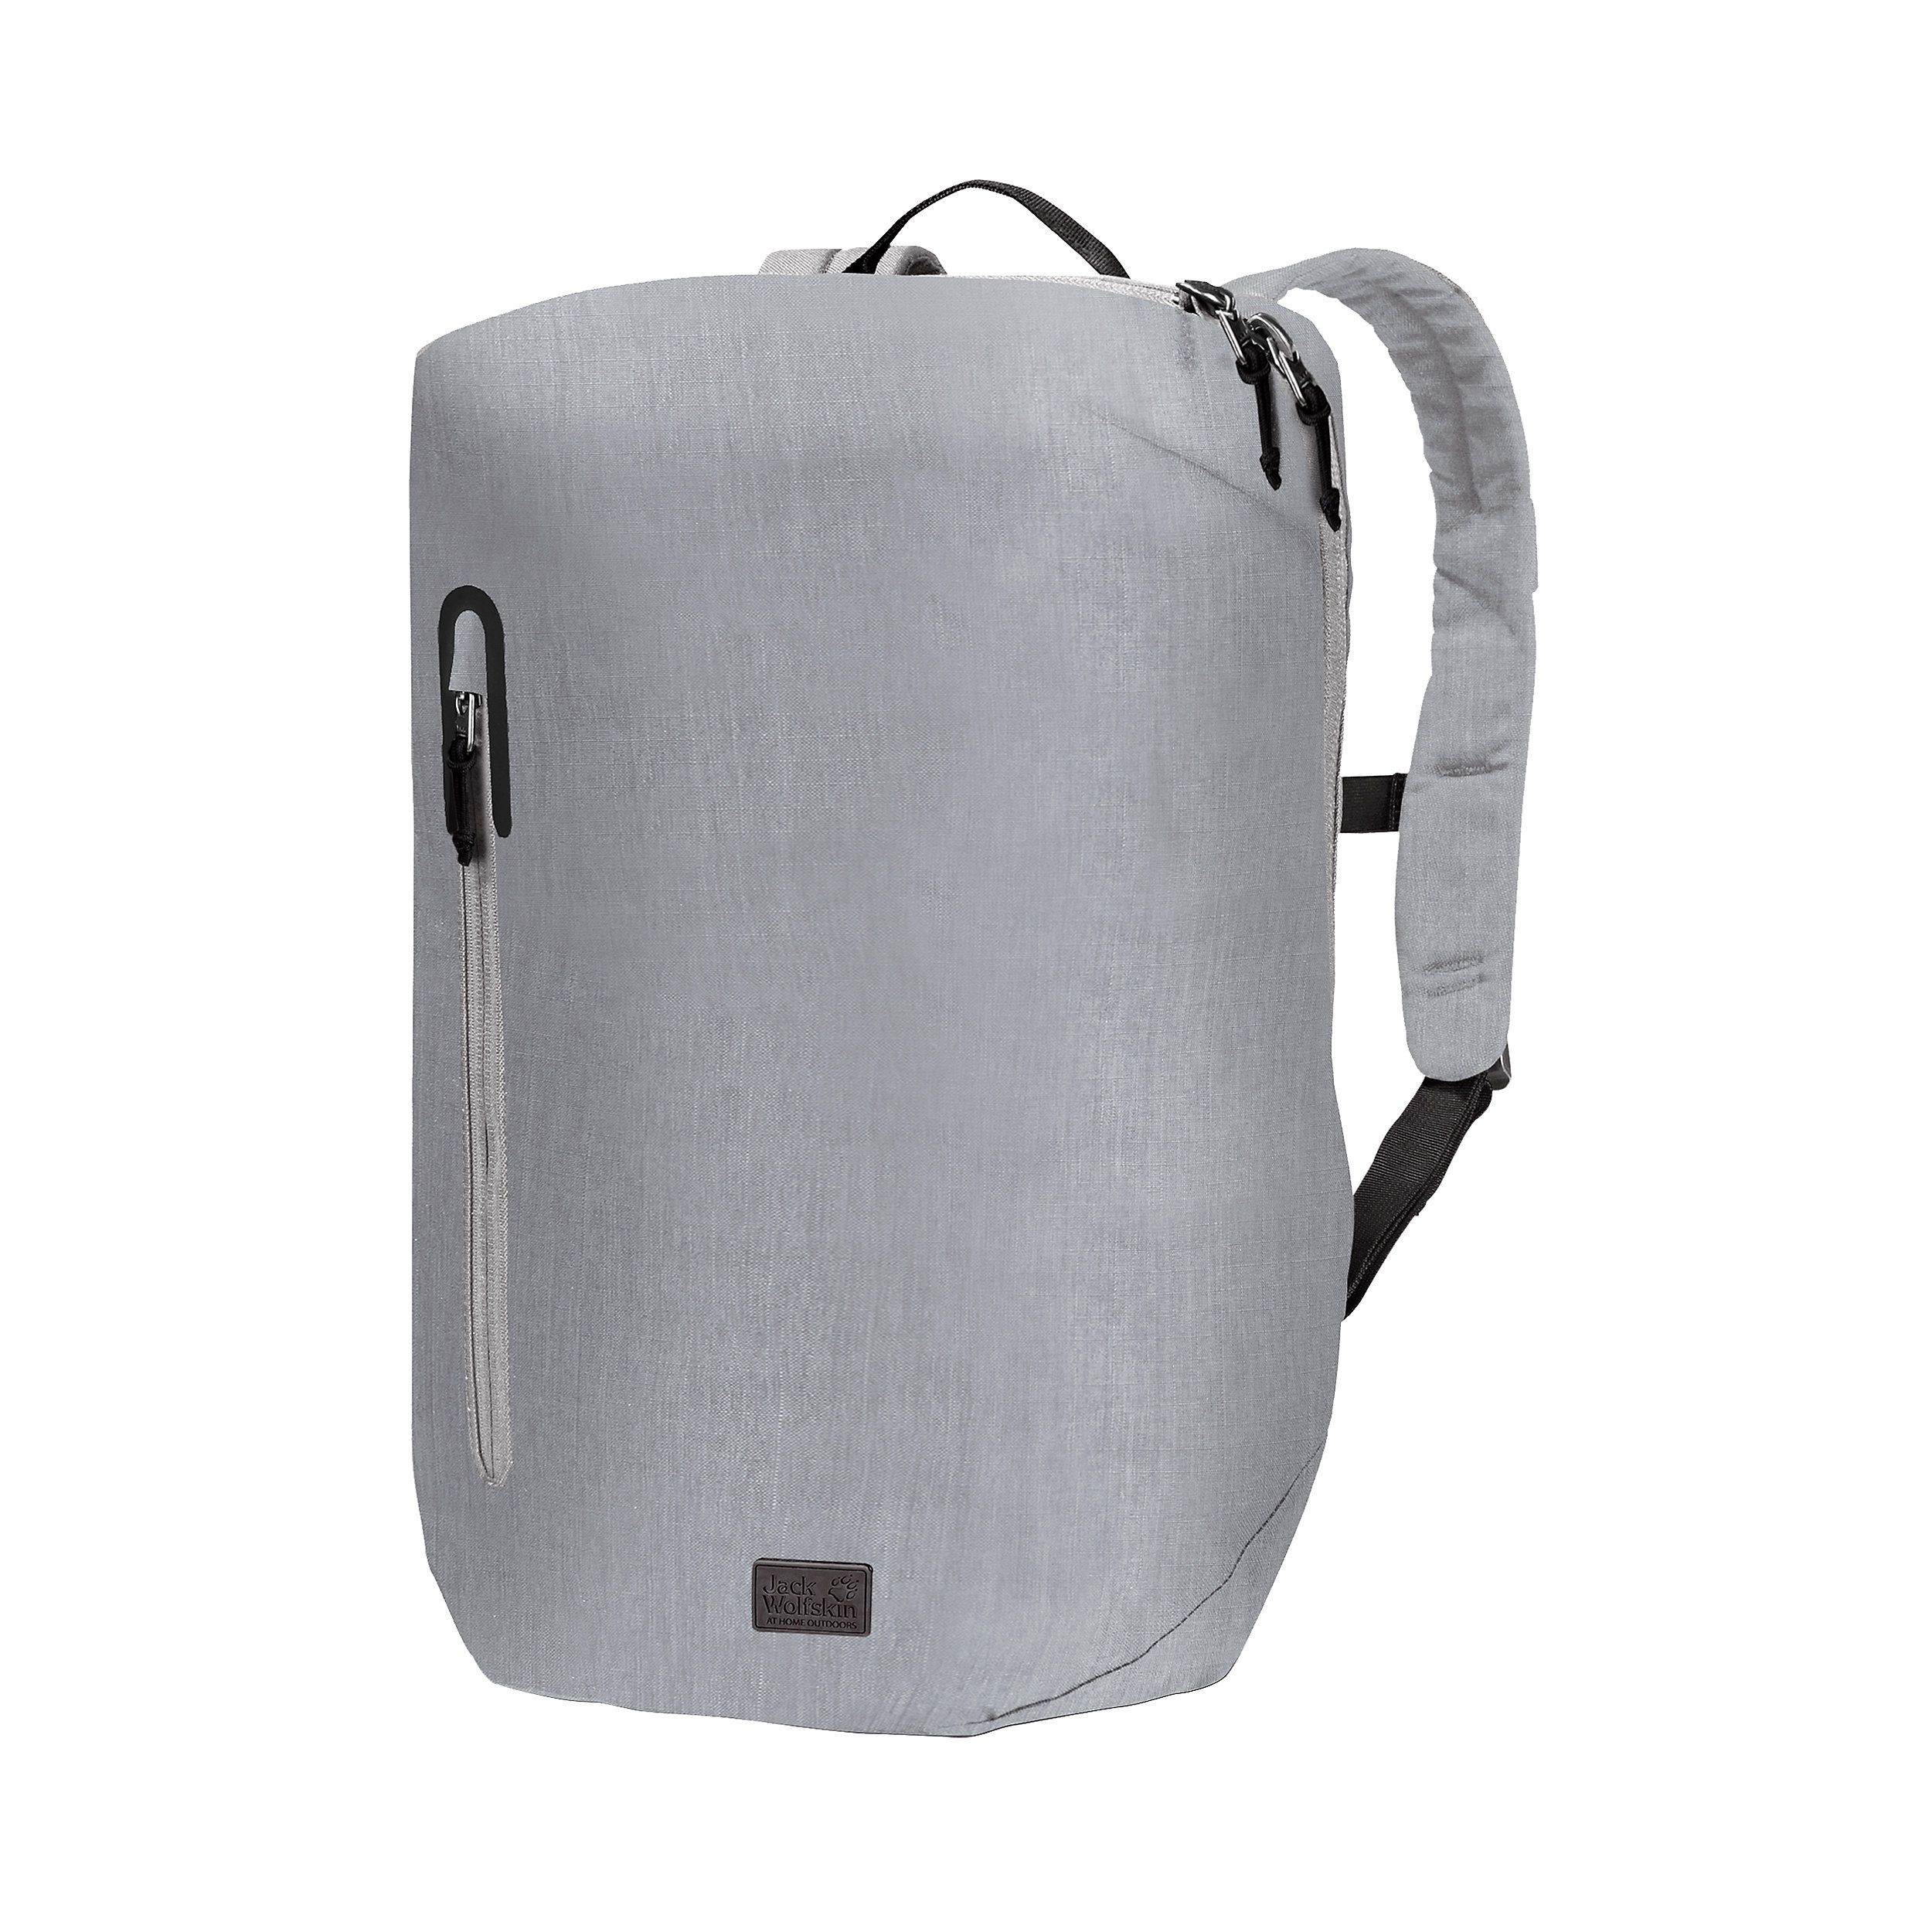 Laptoprucksack Bondi Blend 14 Zoll Everyday Outdoor M 20 Liter